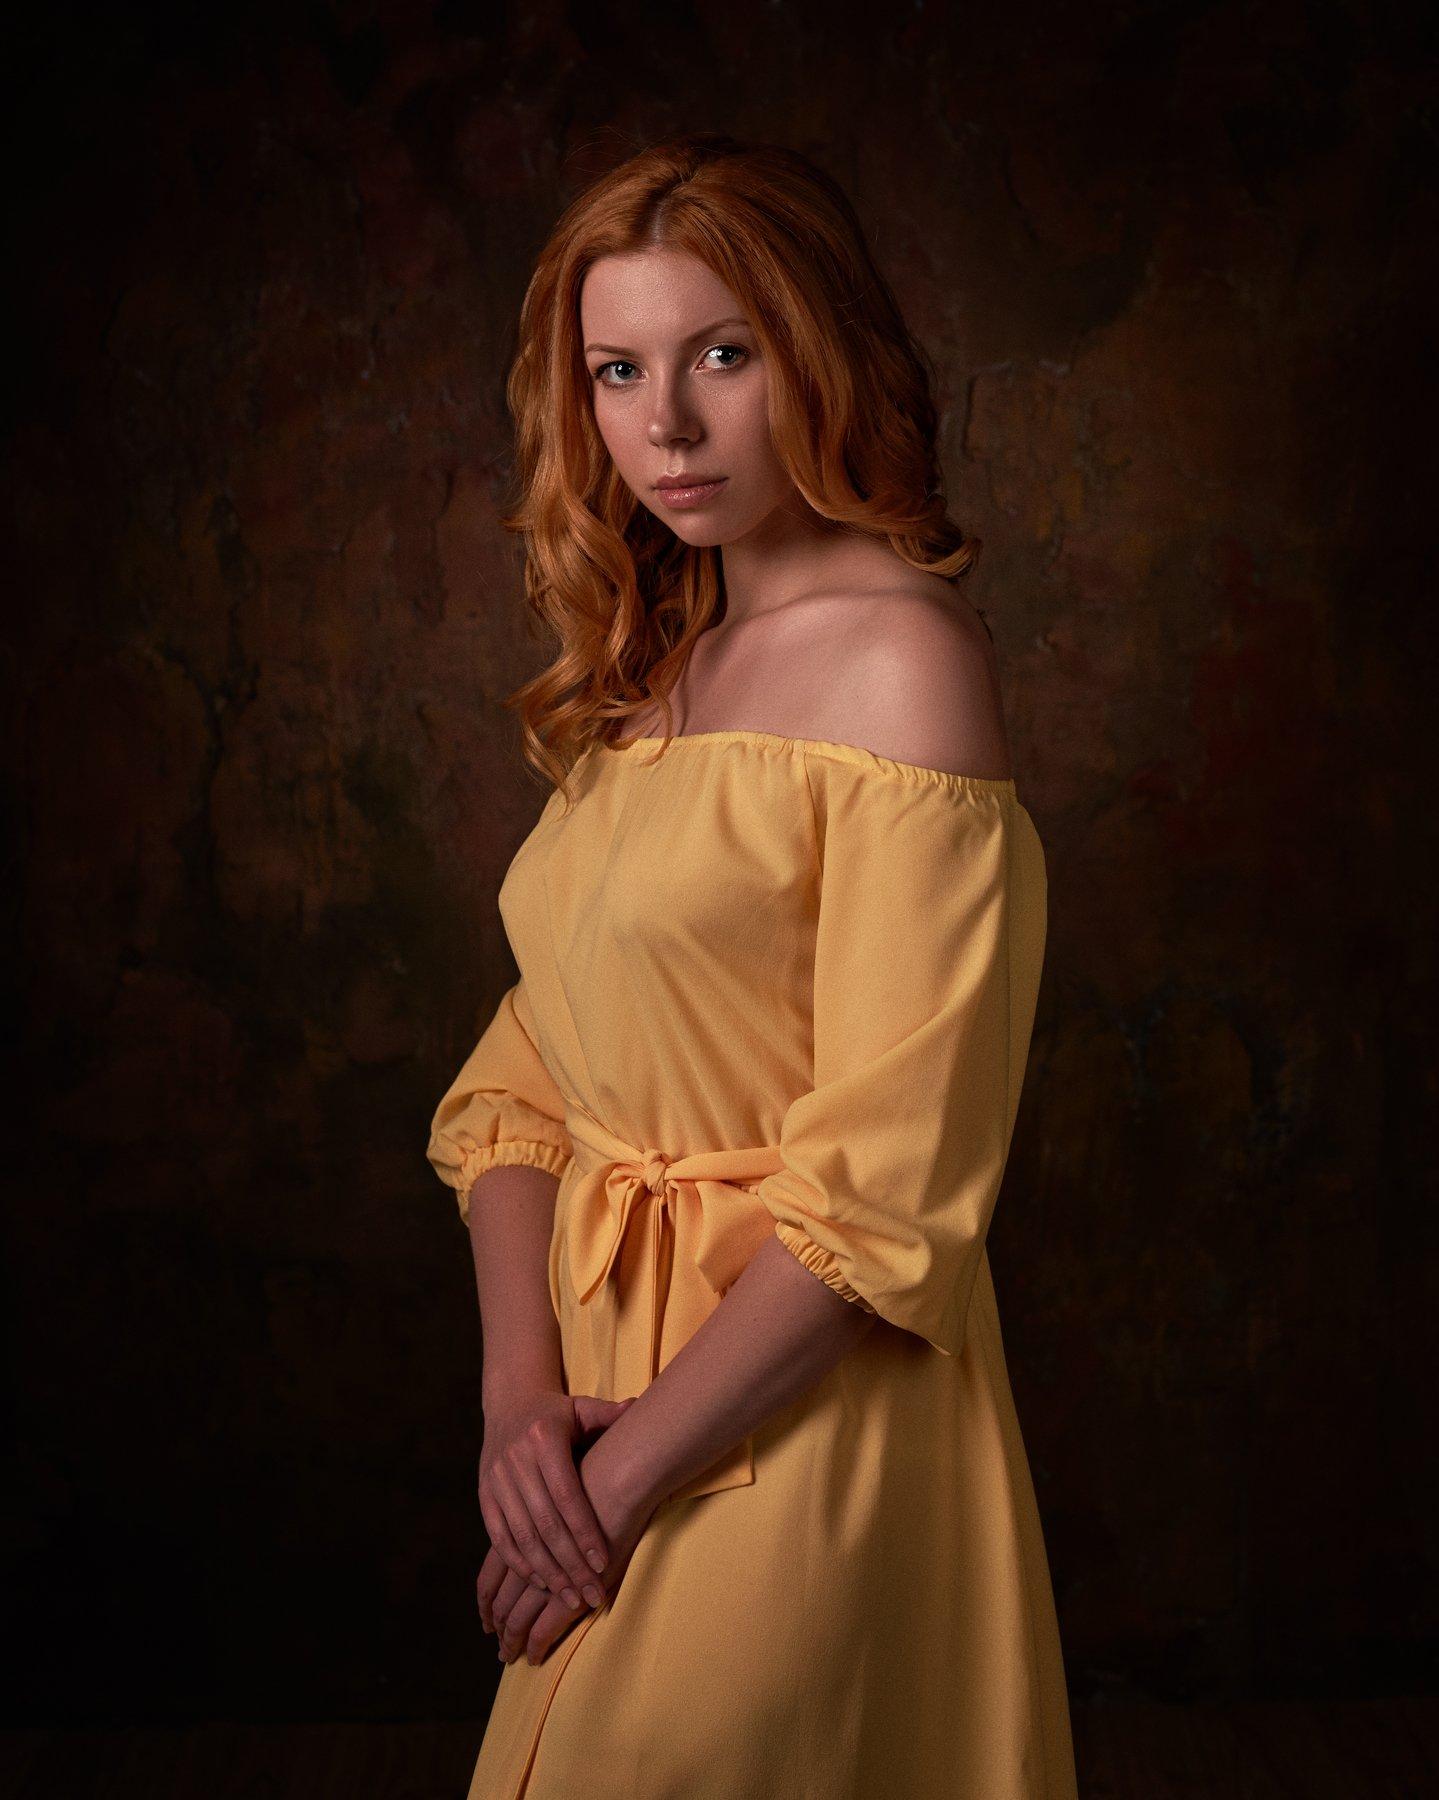 pyzhikphoto, портрет, классика, классический портрет, портрет девушки, женский портрет, portrait, classic, art, красавица, фото, девушка, Макс Пыжик